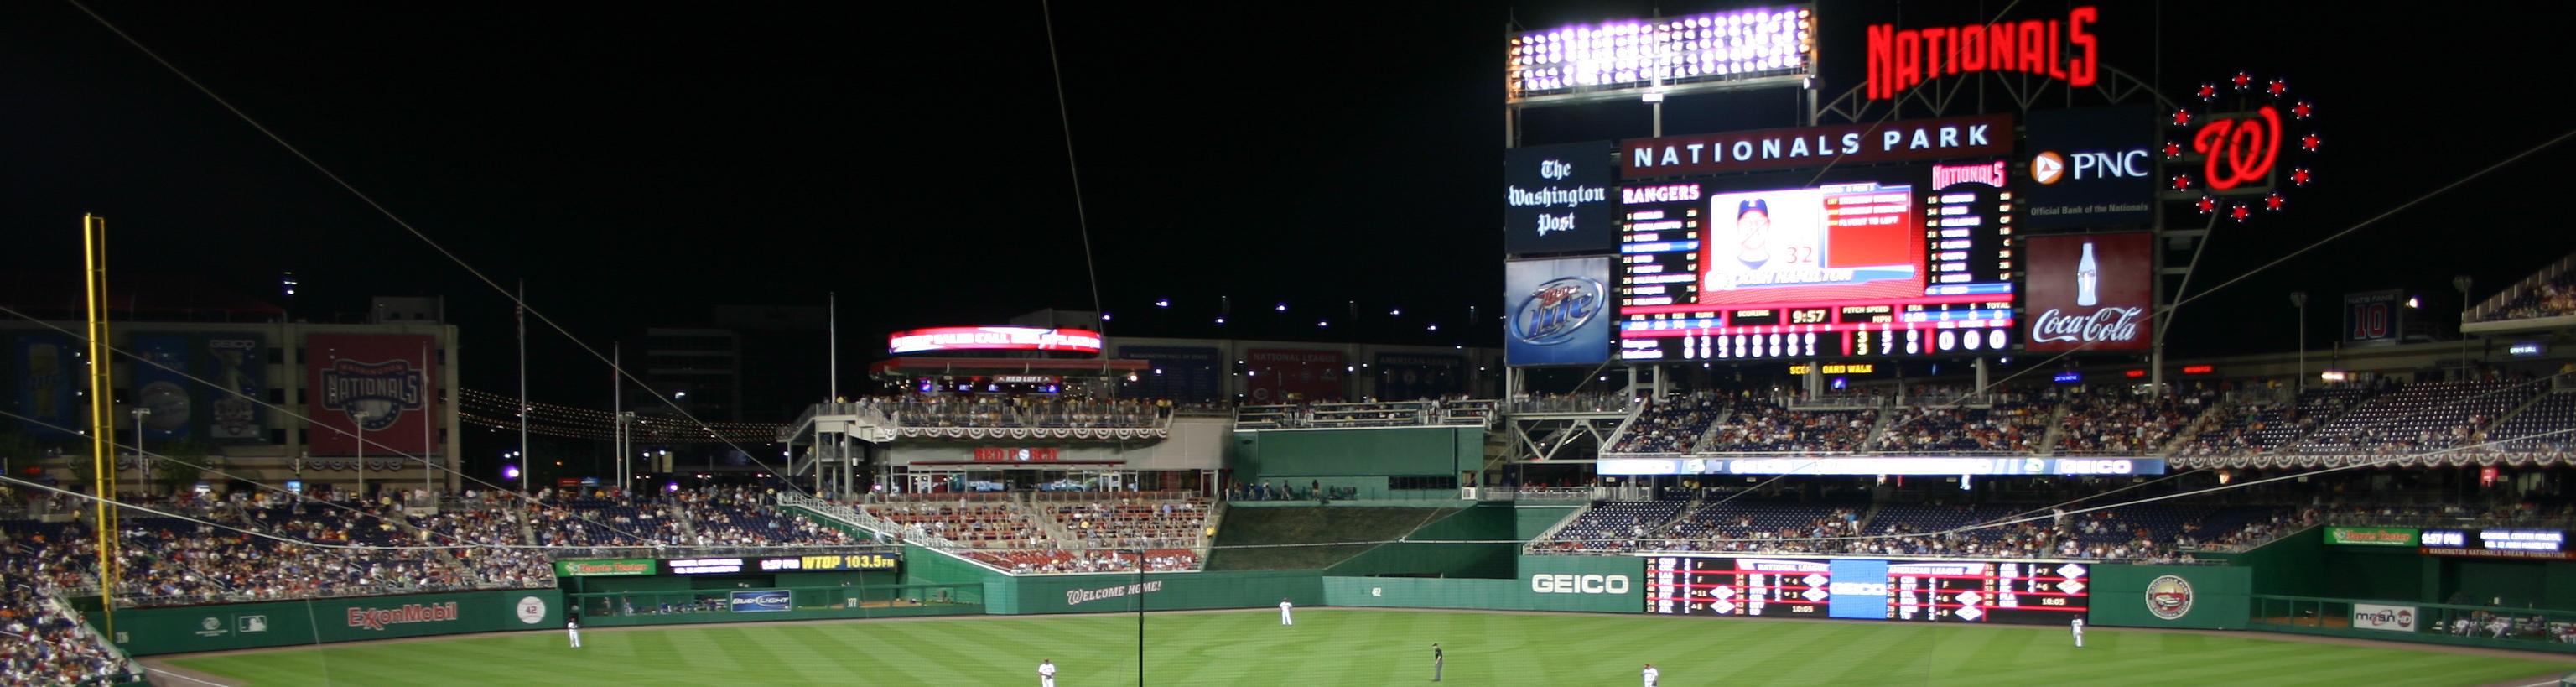 Nationals Park,east coast baseball tours,baseball trips